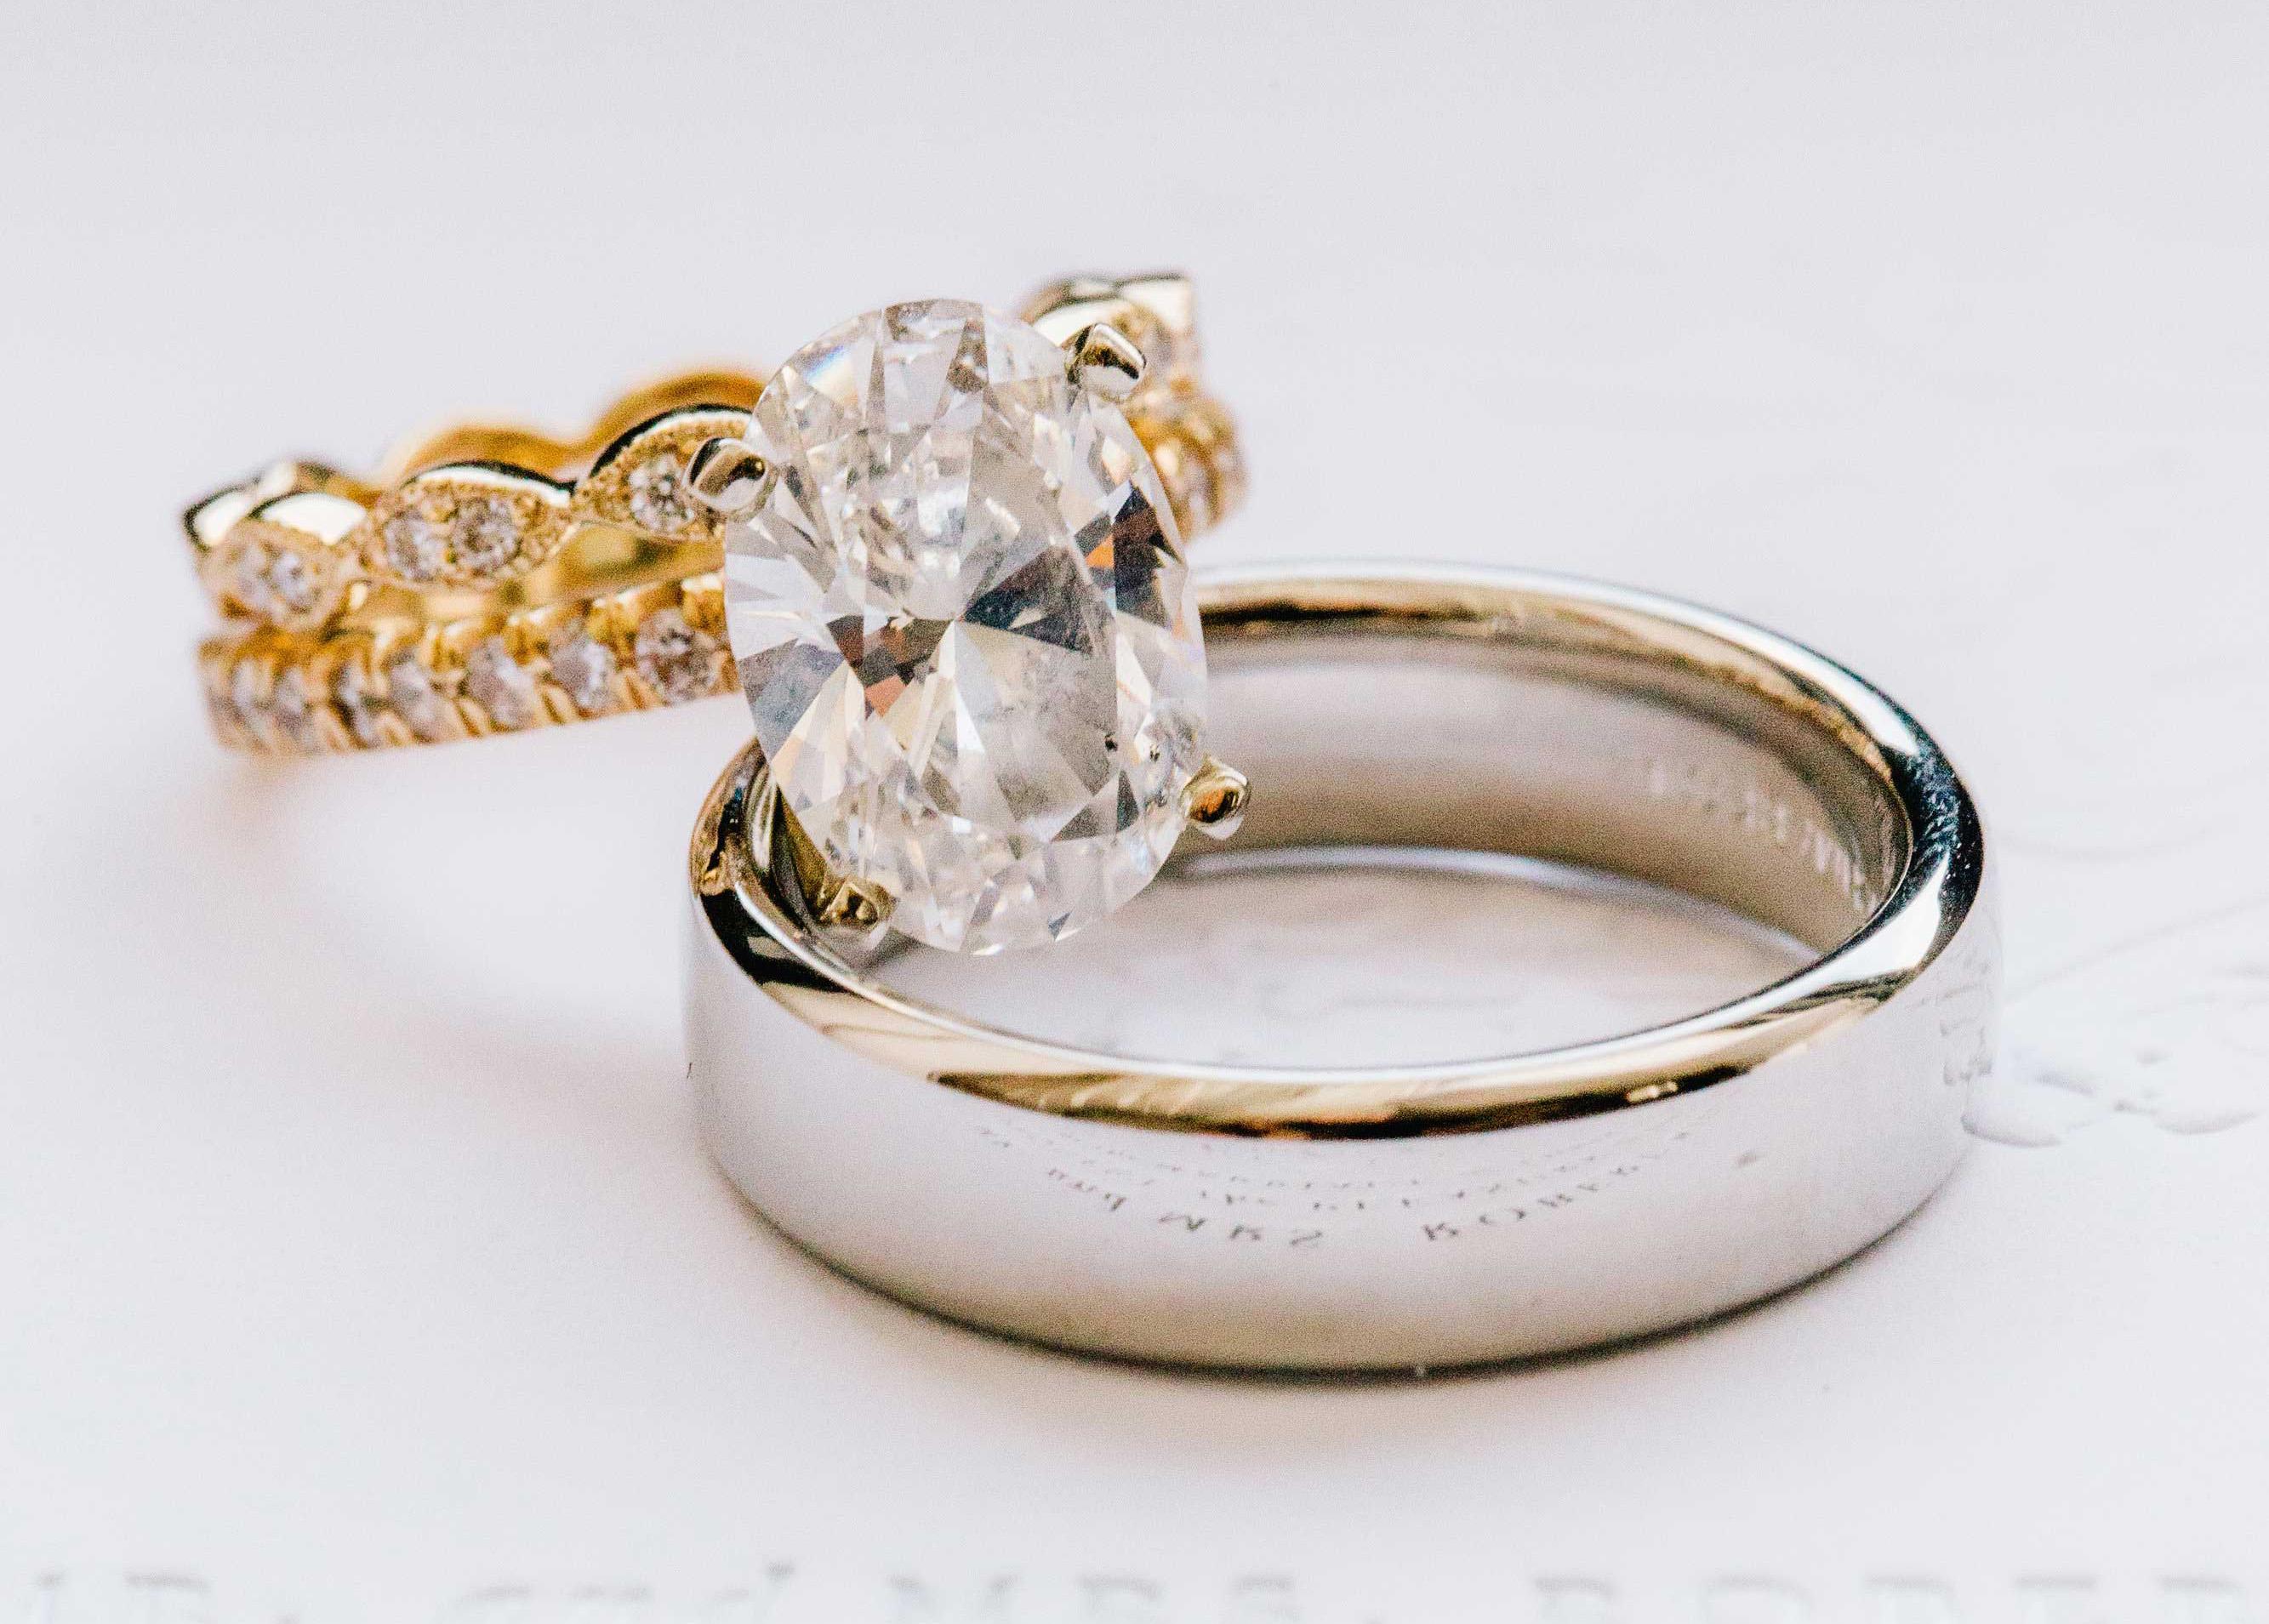 jesse plemons kirsten dunst engagement ring inspiration oval diamond yellow gold